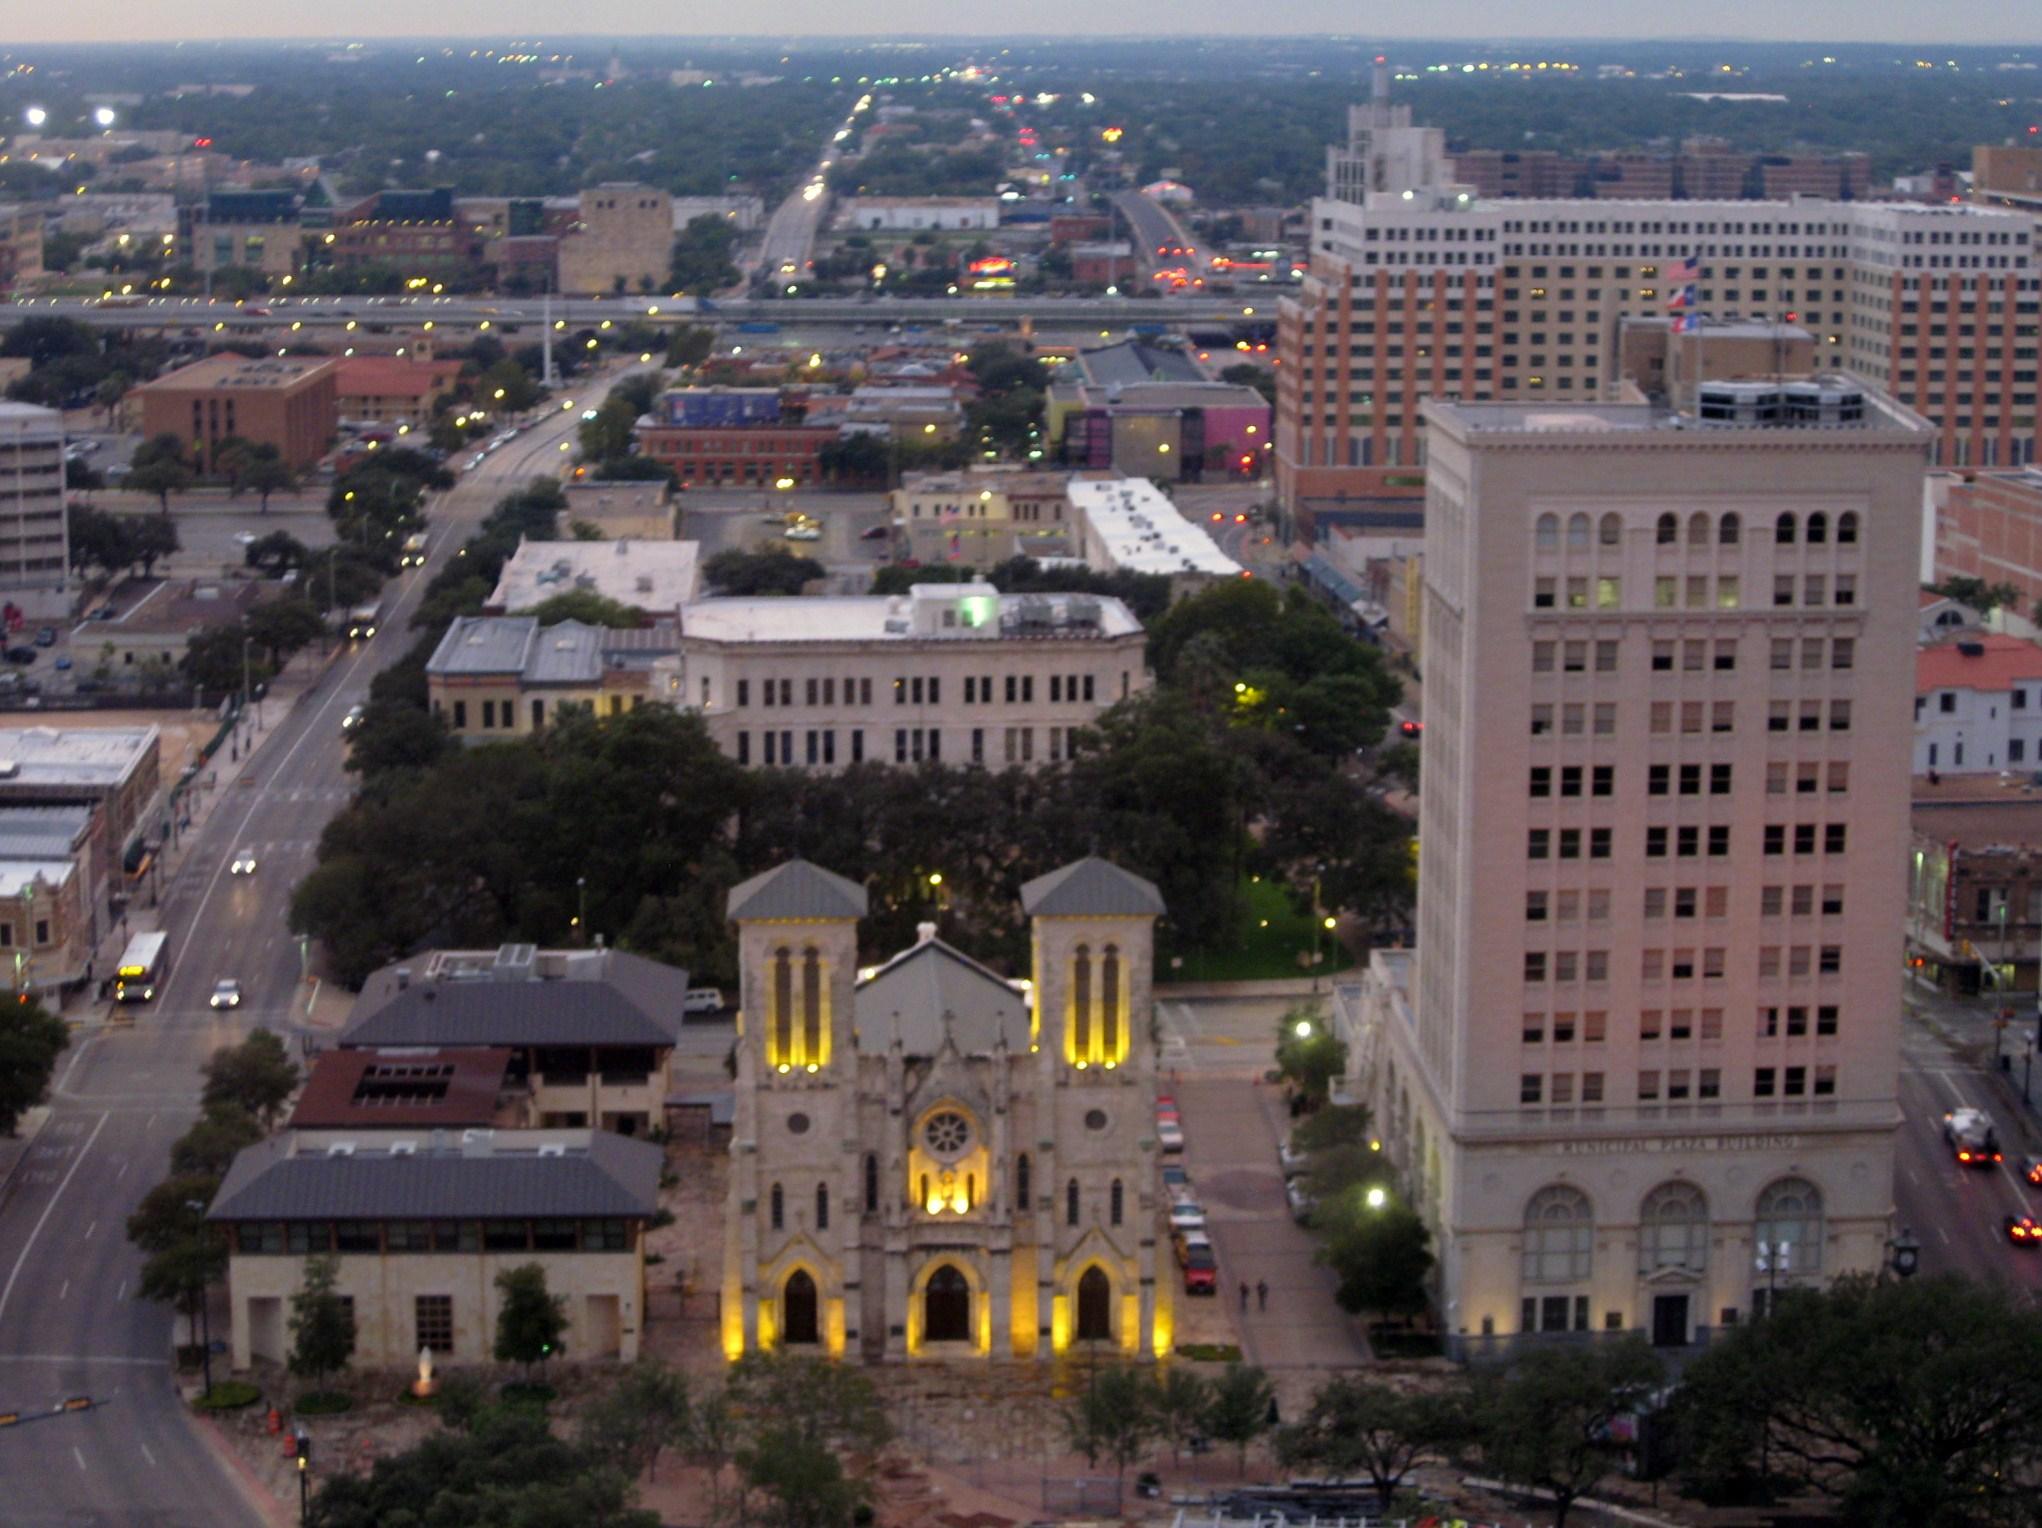 35 Bar & Grille LLC v. City of San Antonio - Wikipedia